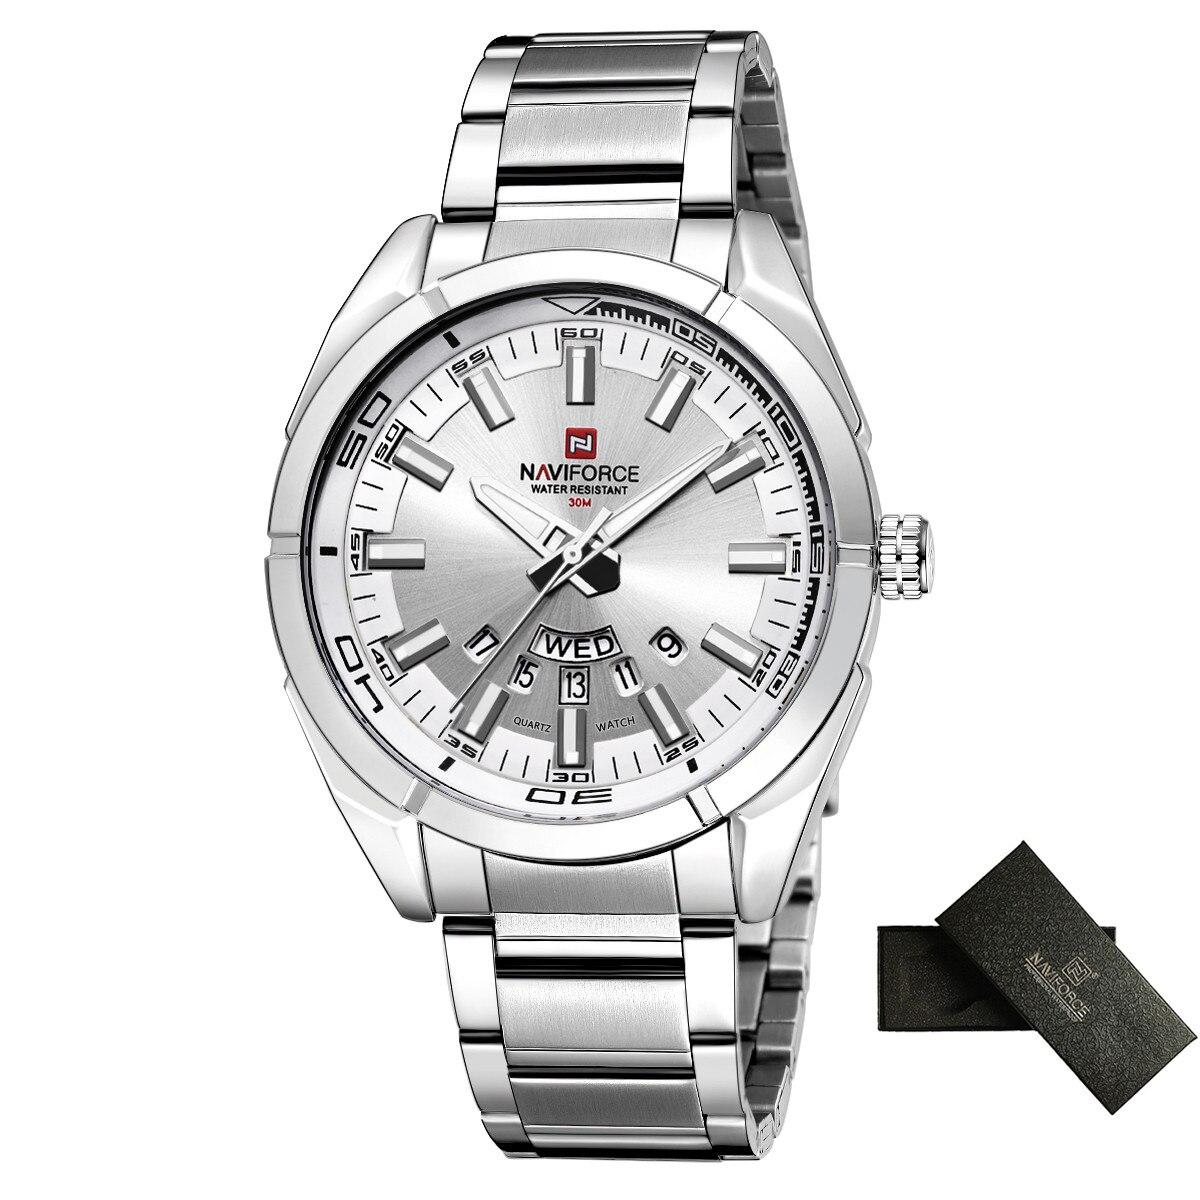 NAVIFORCE Brand Men Watches Business Quartz Watch Men's Stainless Steel Band 30M Waterproof Date Wristwatches Relogio Masculino 5